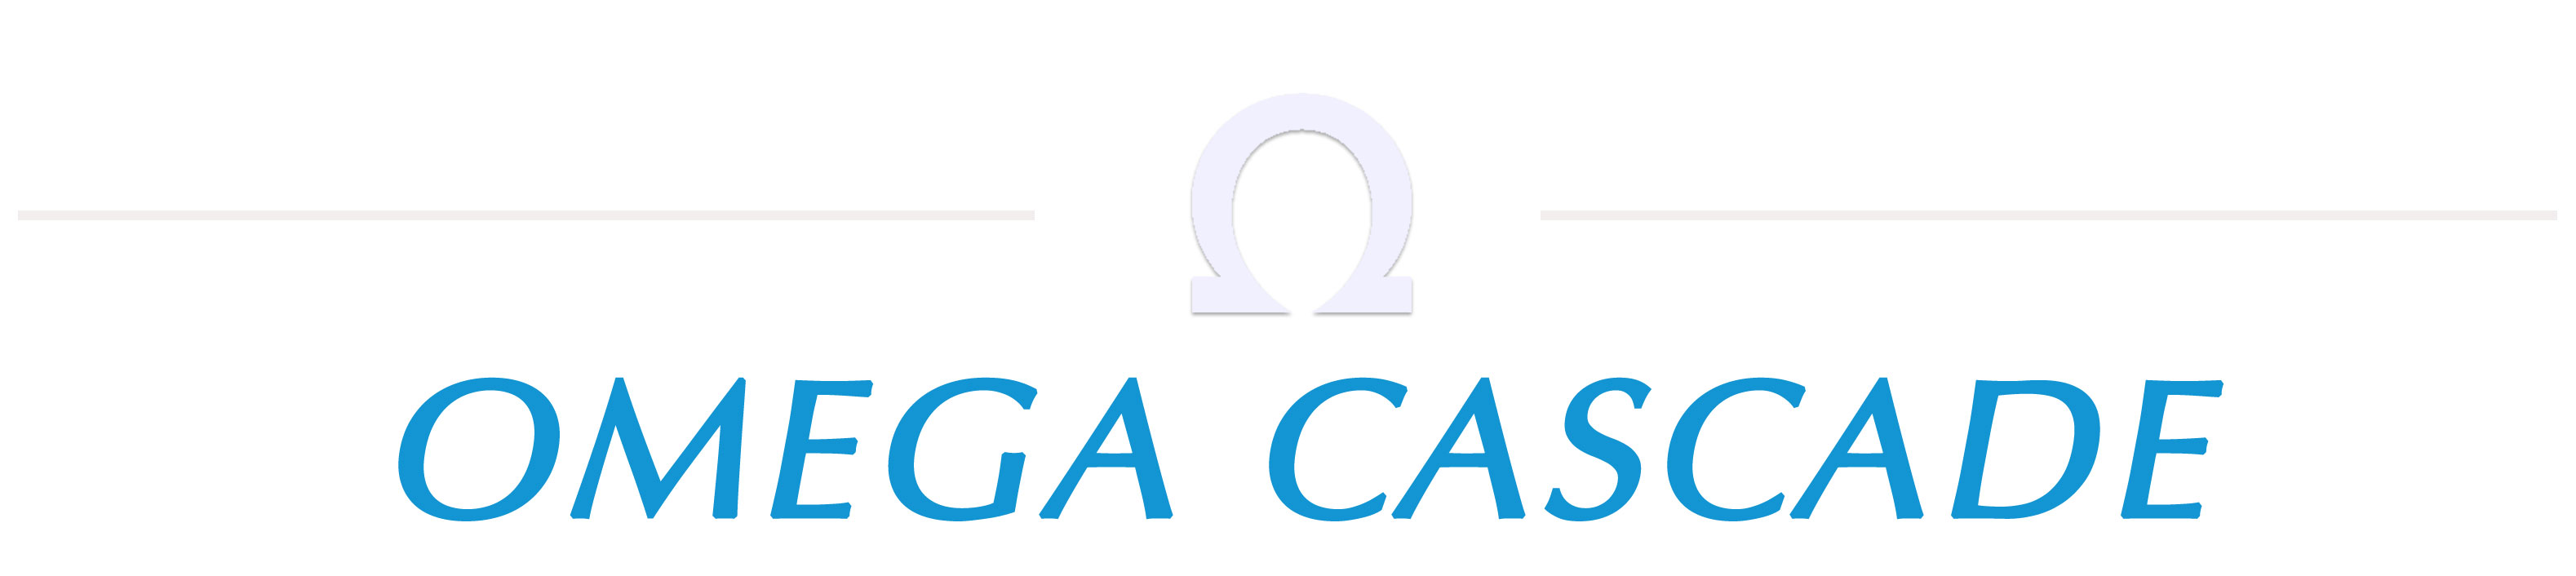 iMovR Omega Cascade